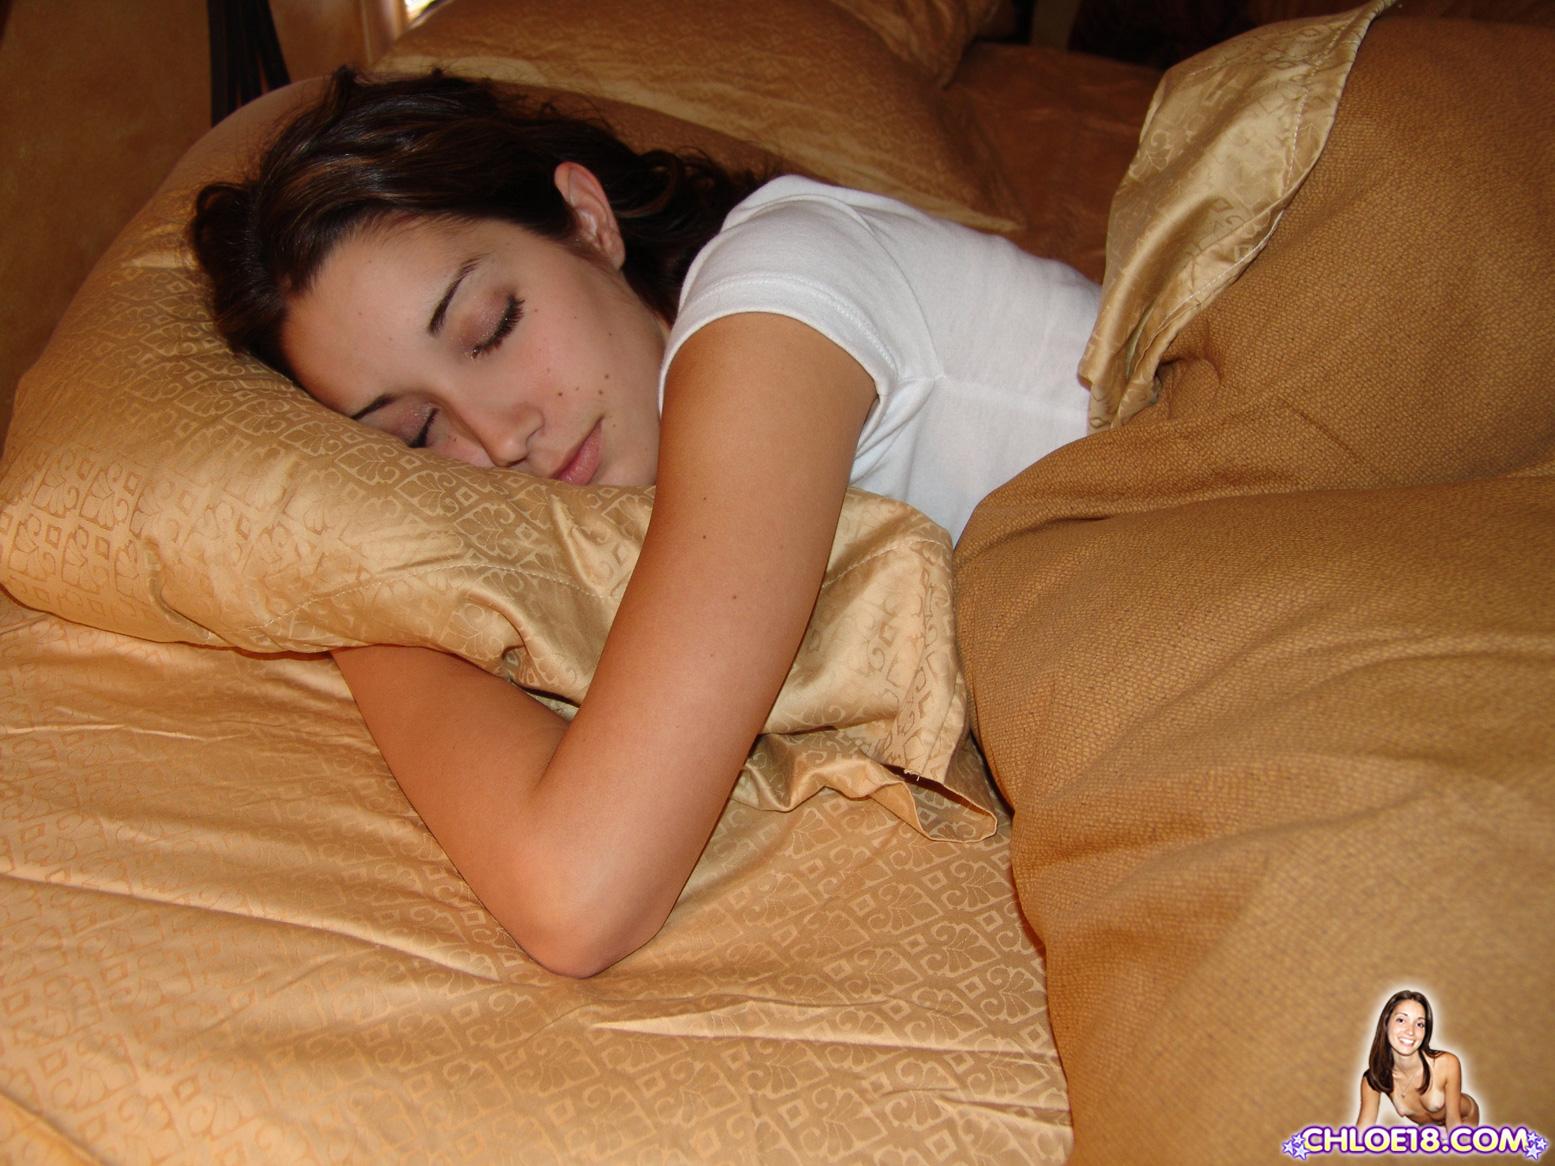 Спящую в жопу трахнул — pic 12